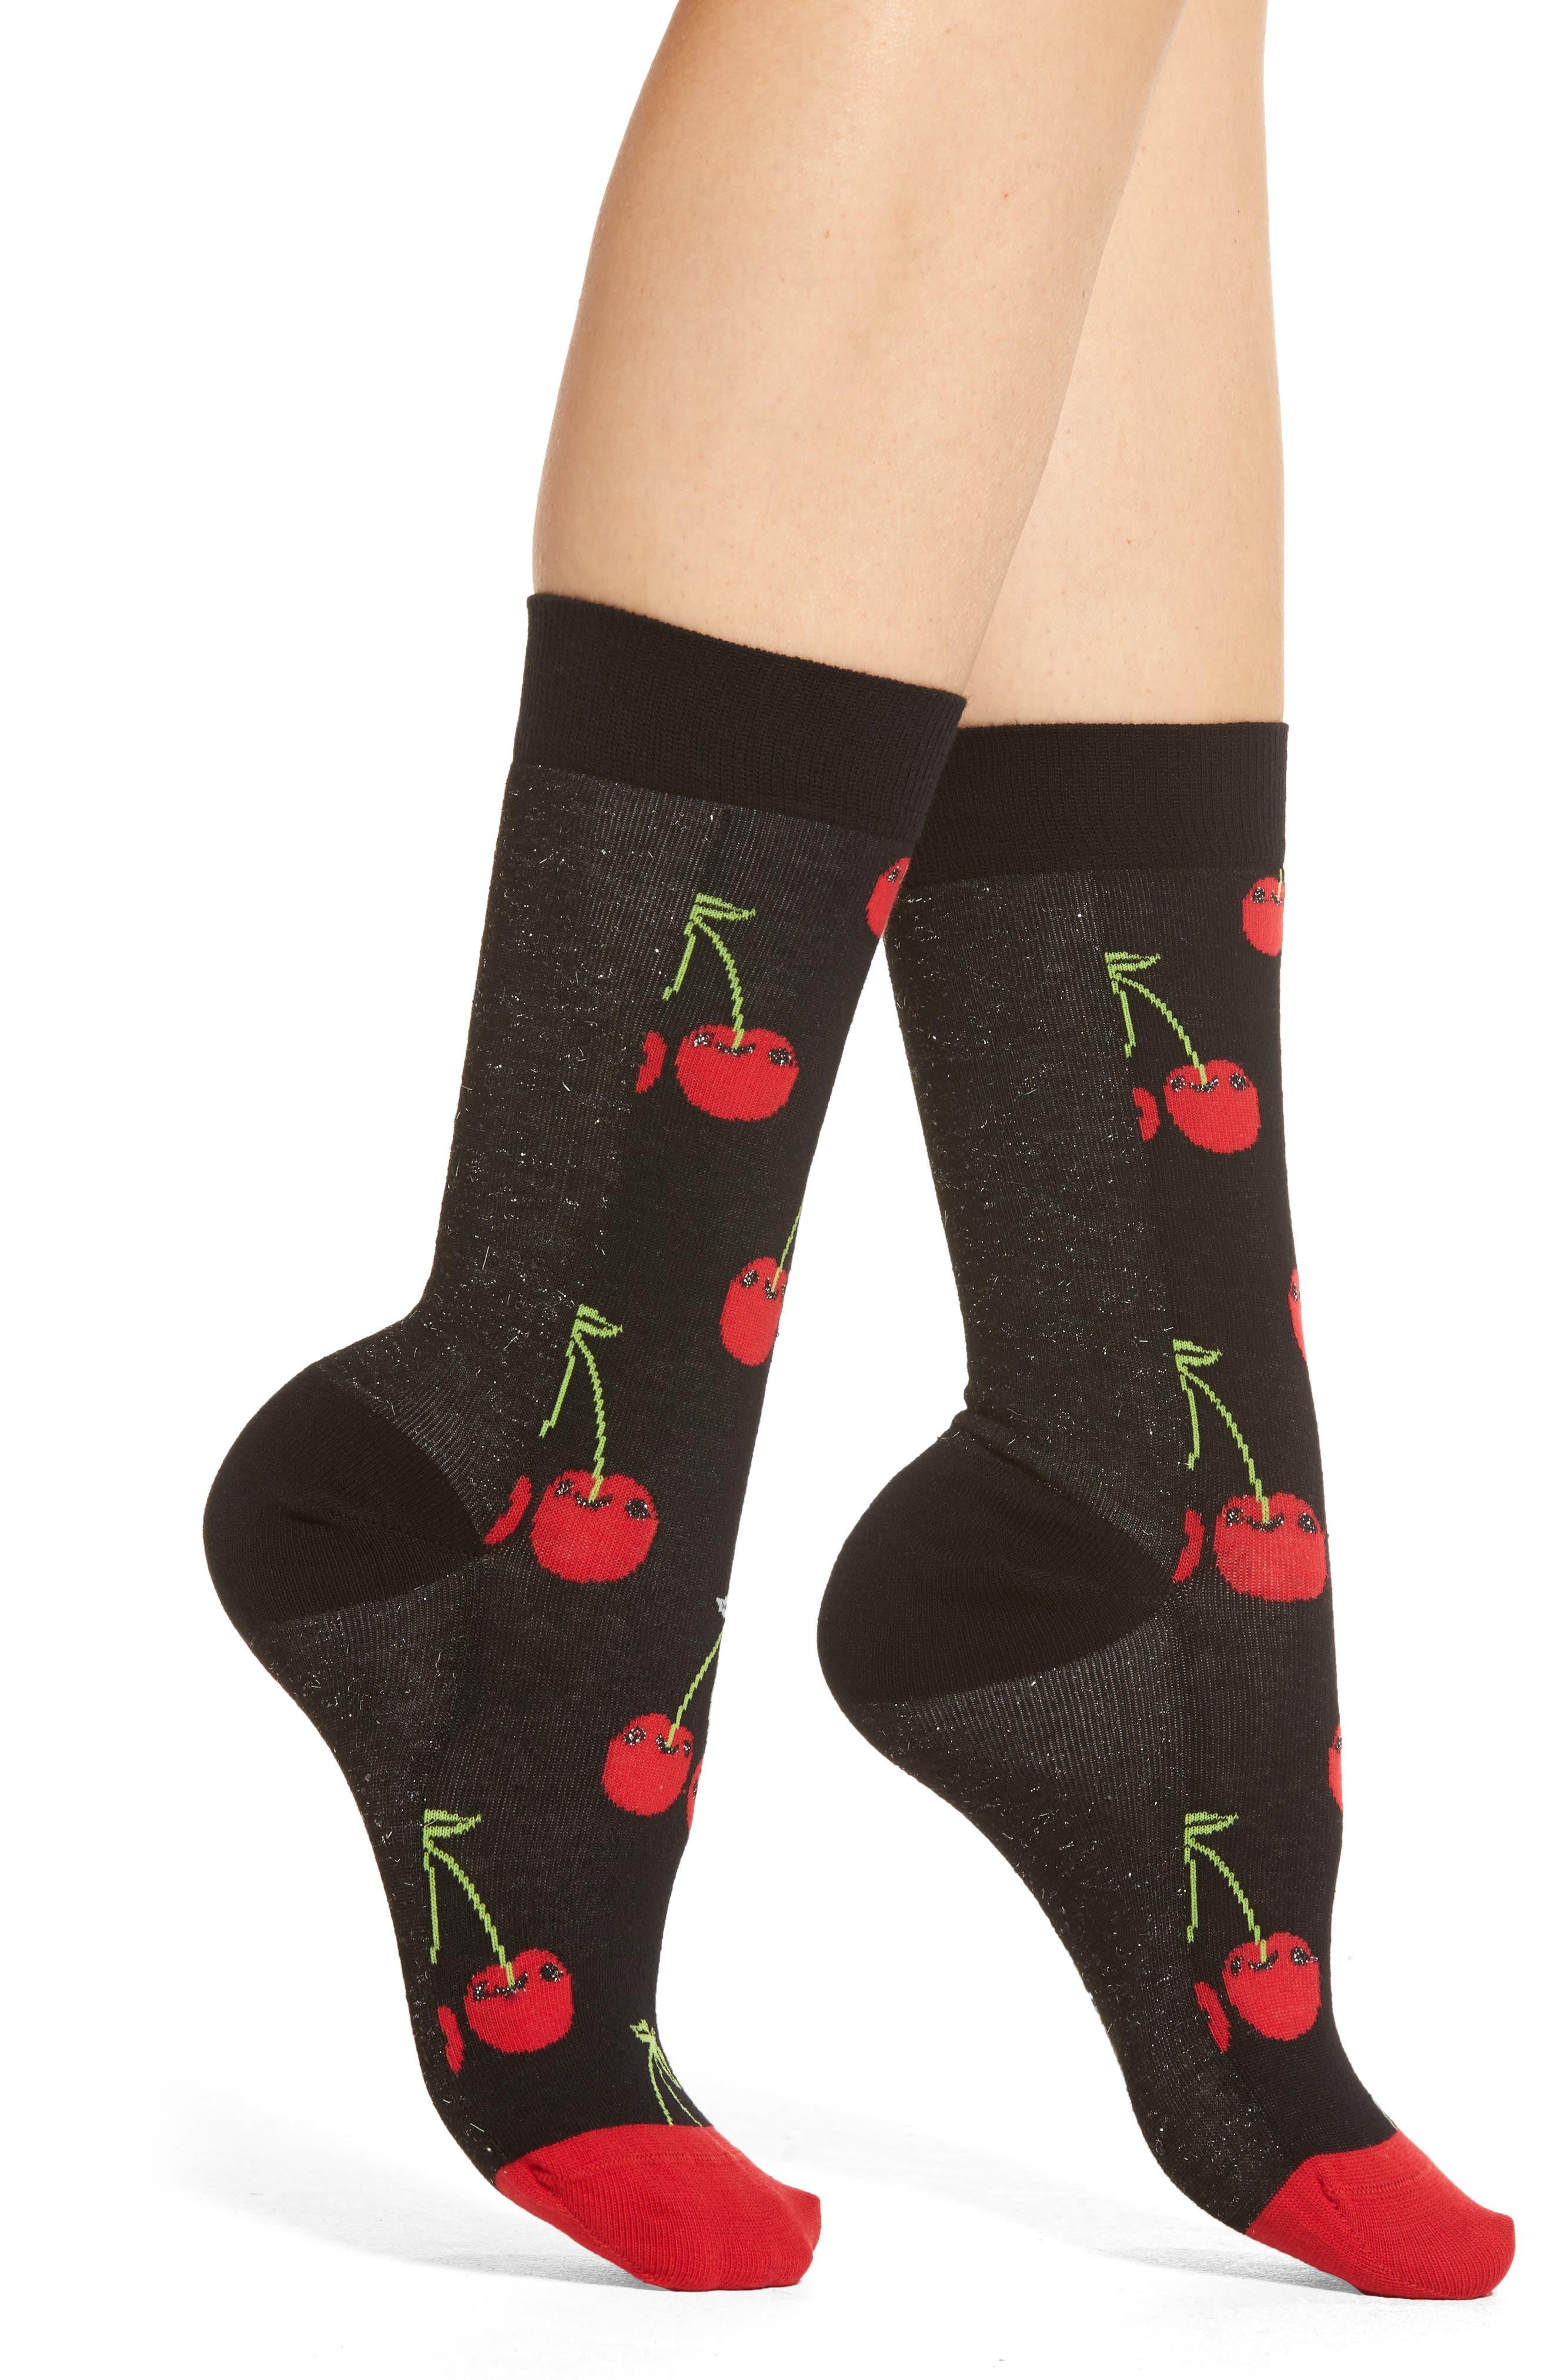 Cherry Crew Socks,                             Main thumbnail 1, color,                             Black/ Red